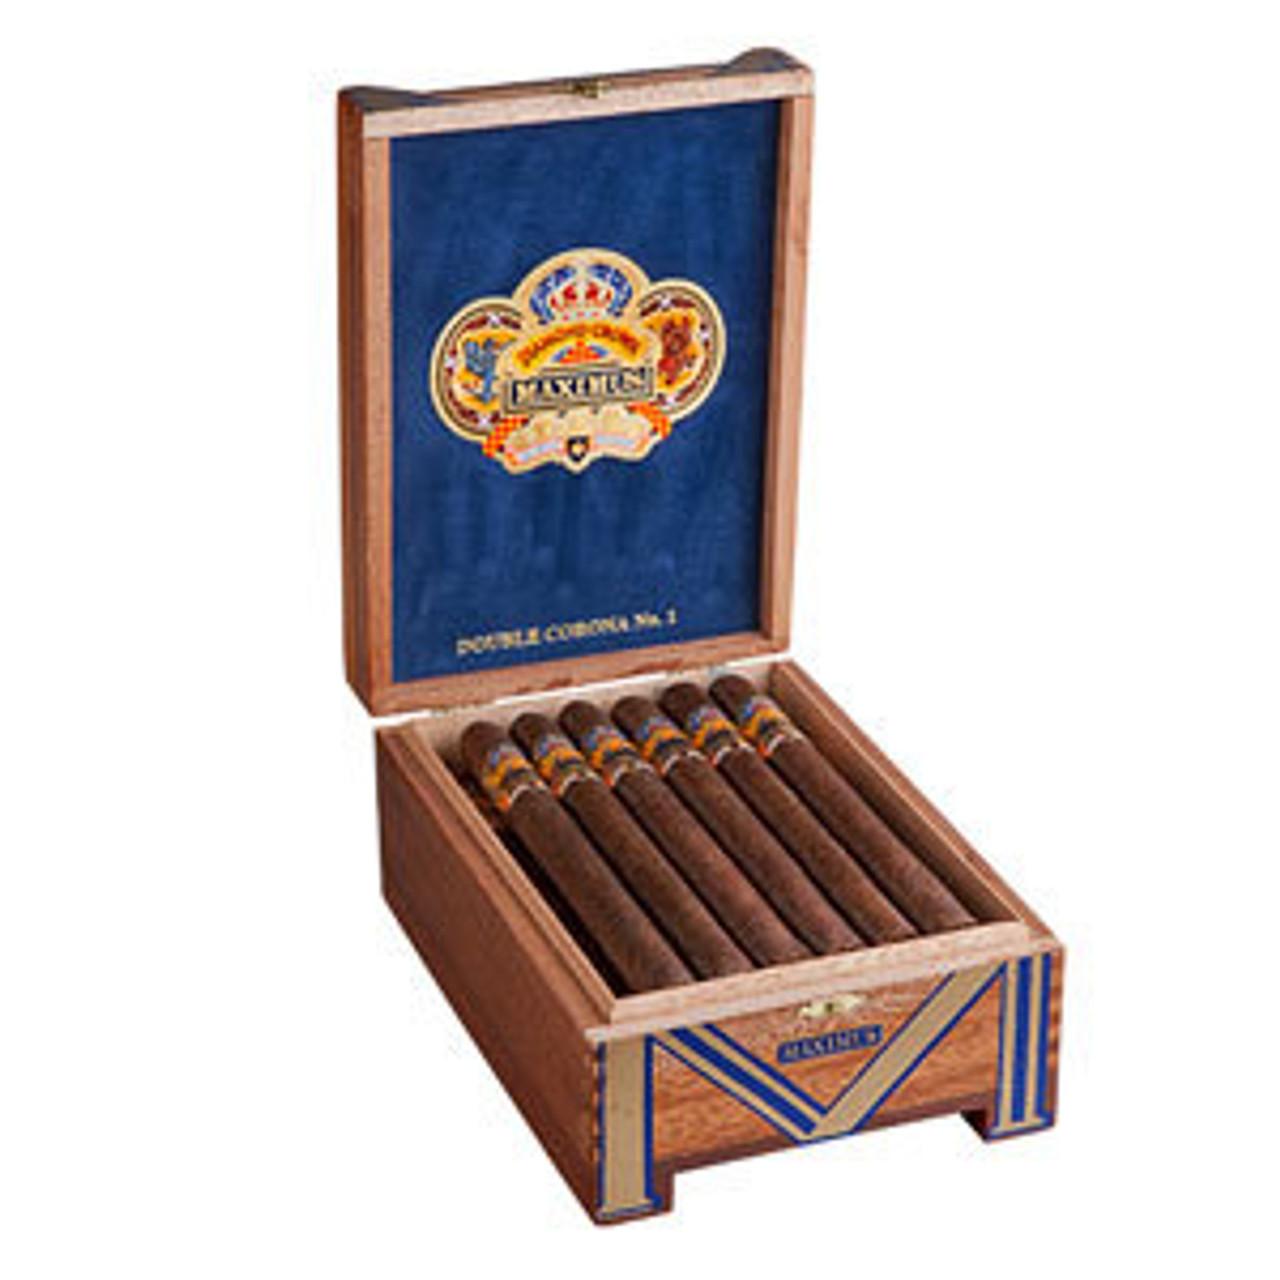 Diamond Crown Maximus Robusto No. 5 Cigars - 5 x 50 (Box of 20)